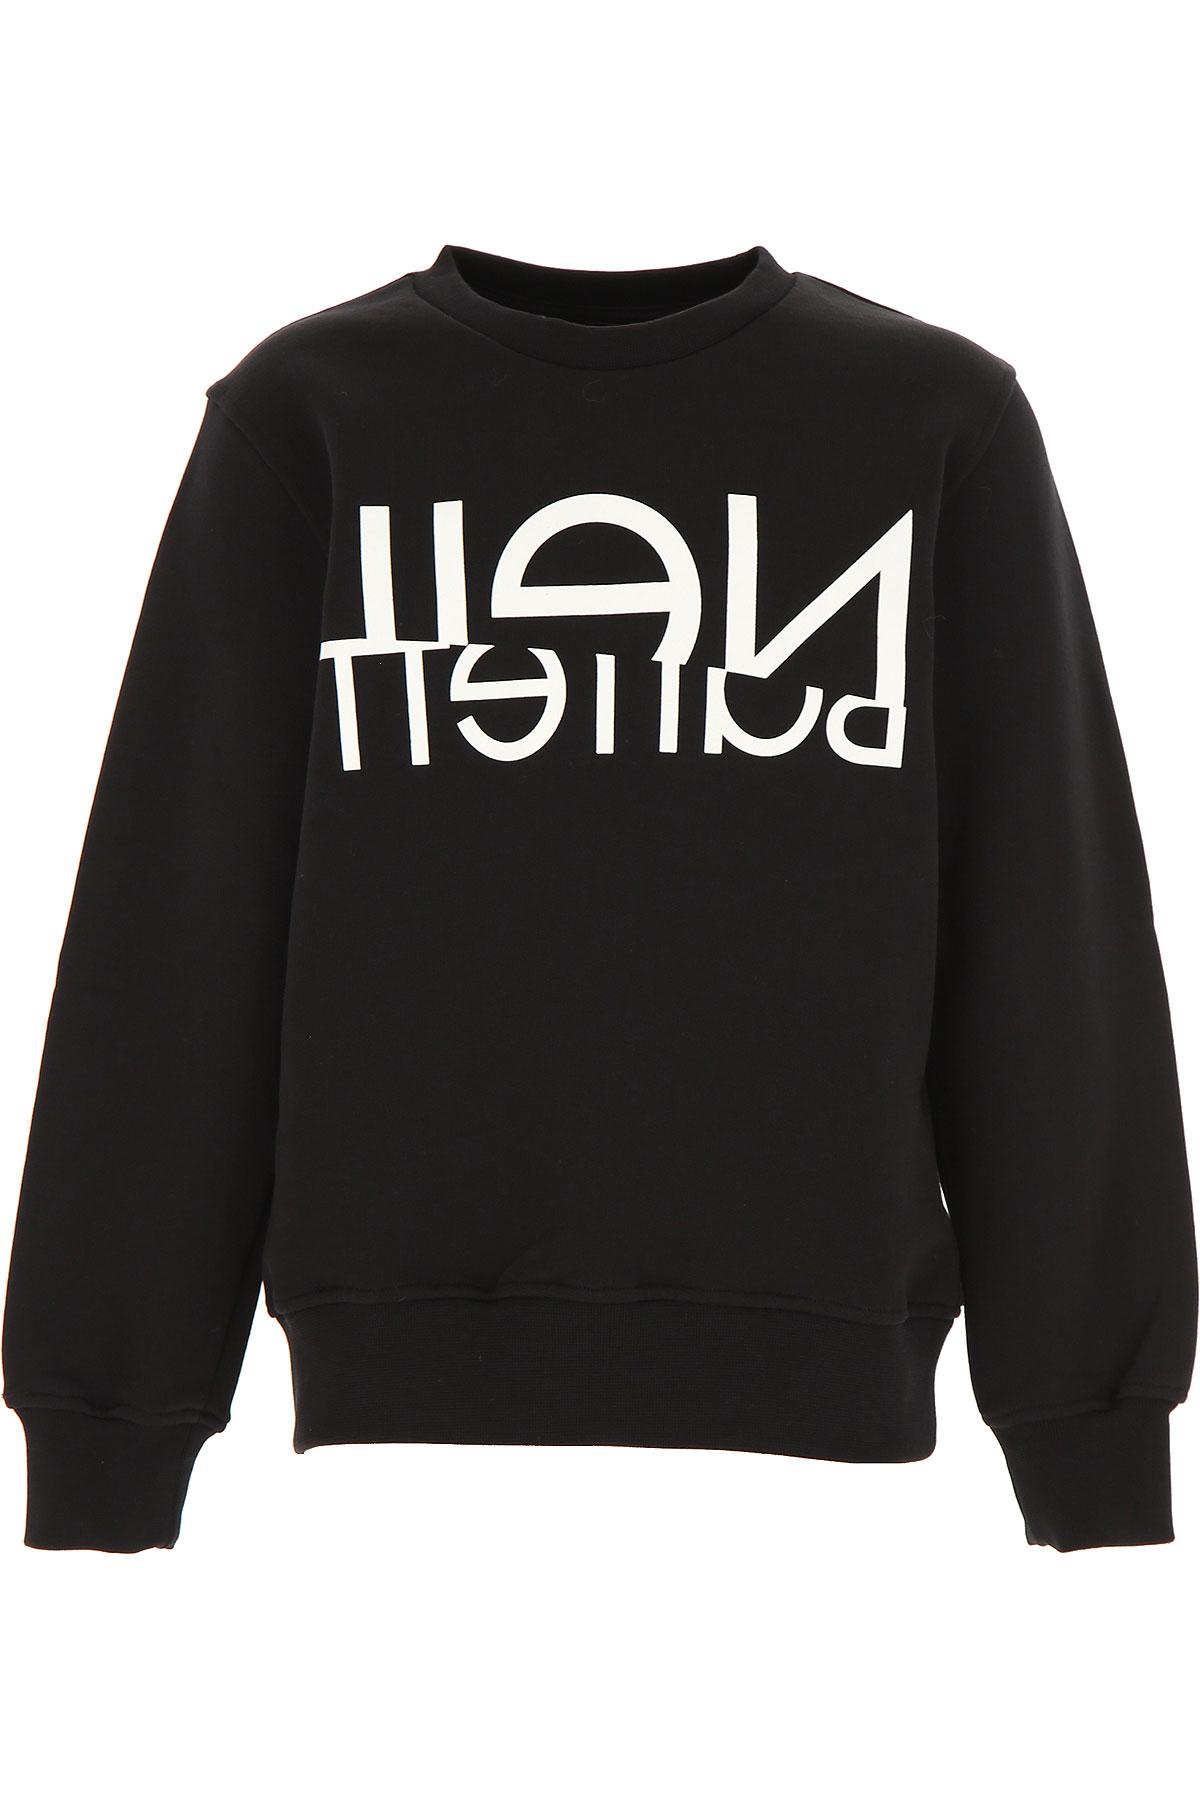 Neil Barrett Kids Sweatshirts & Hoodies for Boys On Sale, Black, Cotton, 2019, 10Y 8Y